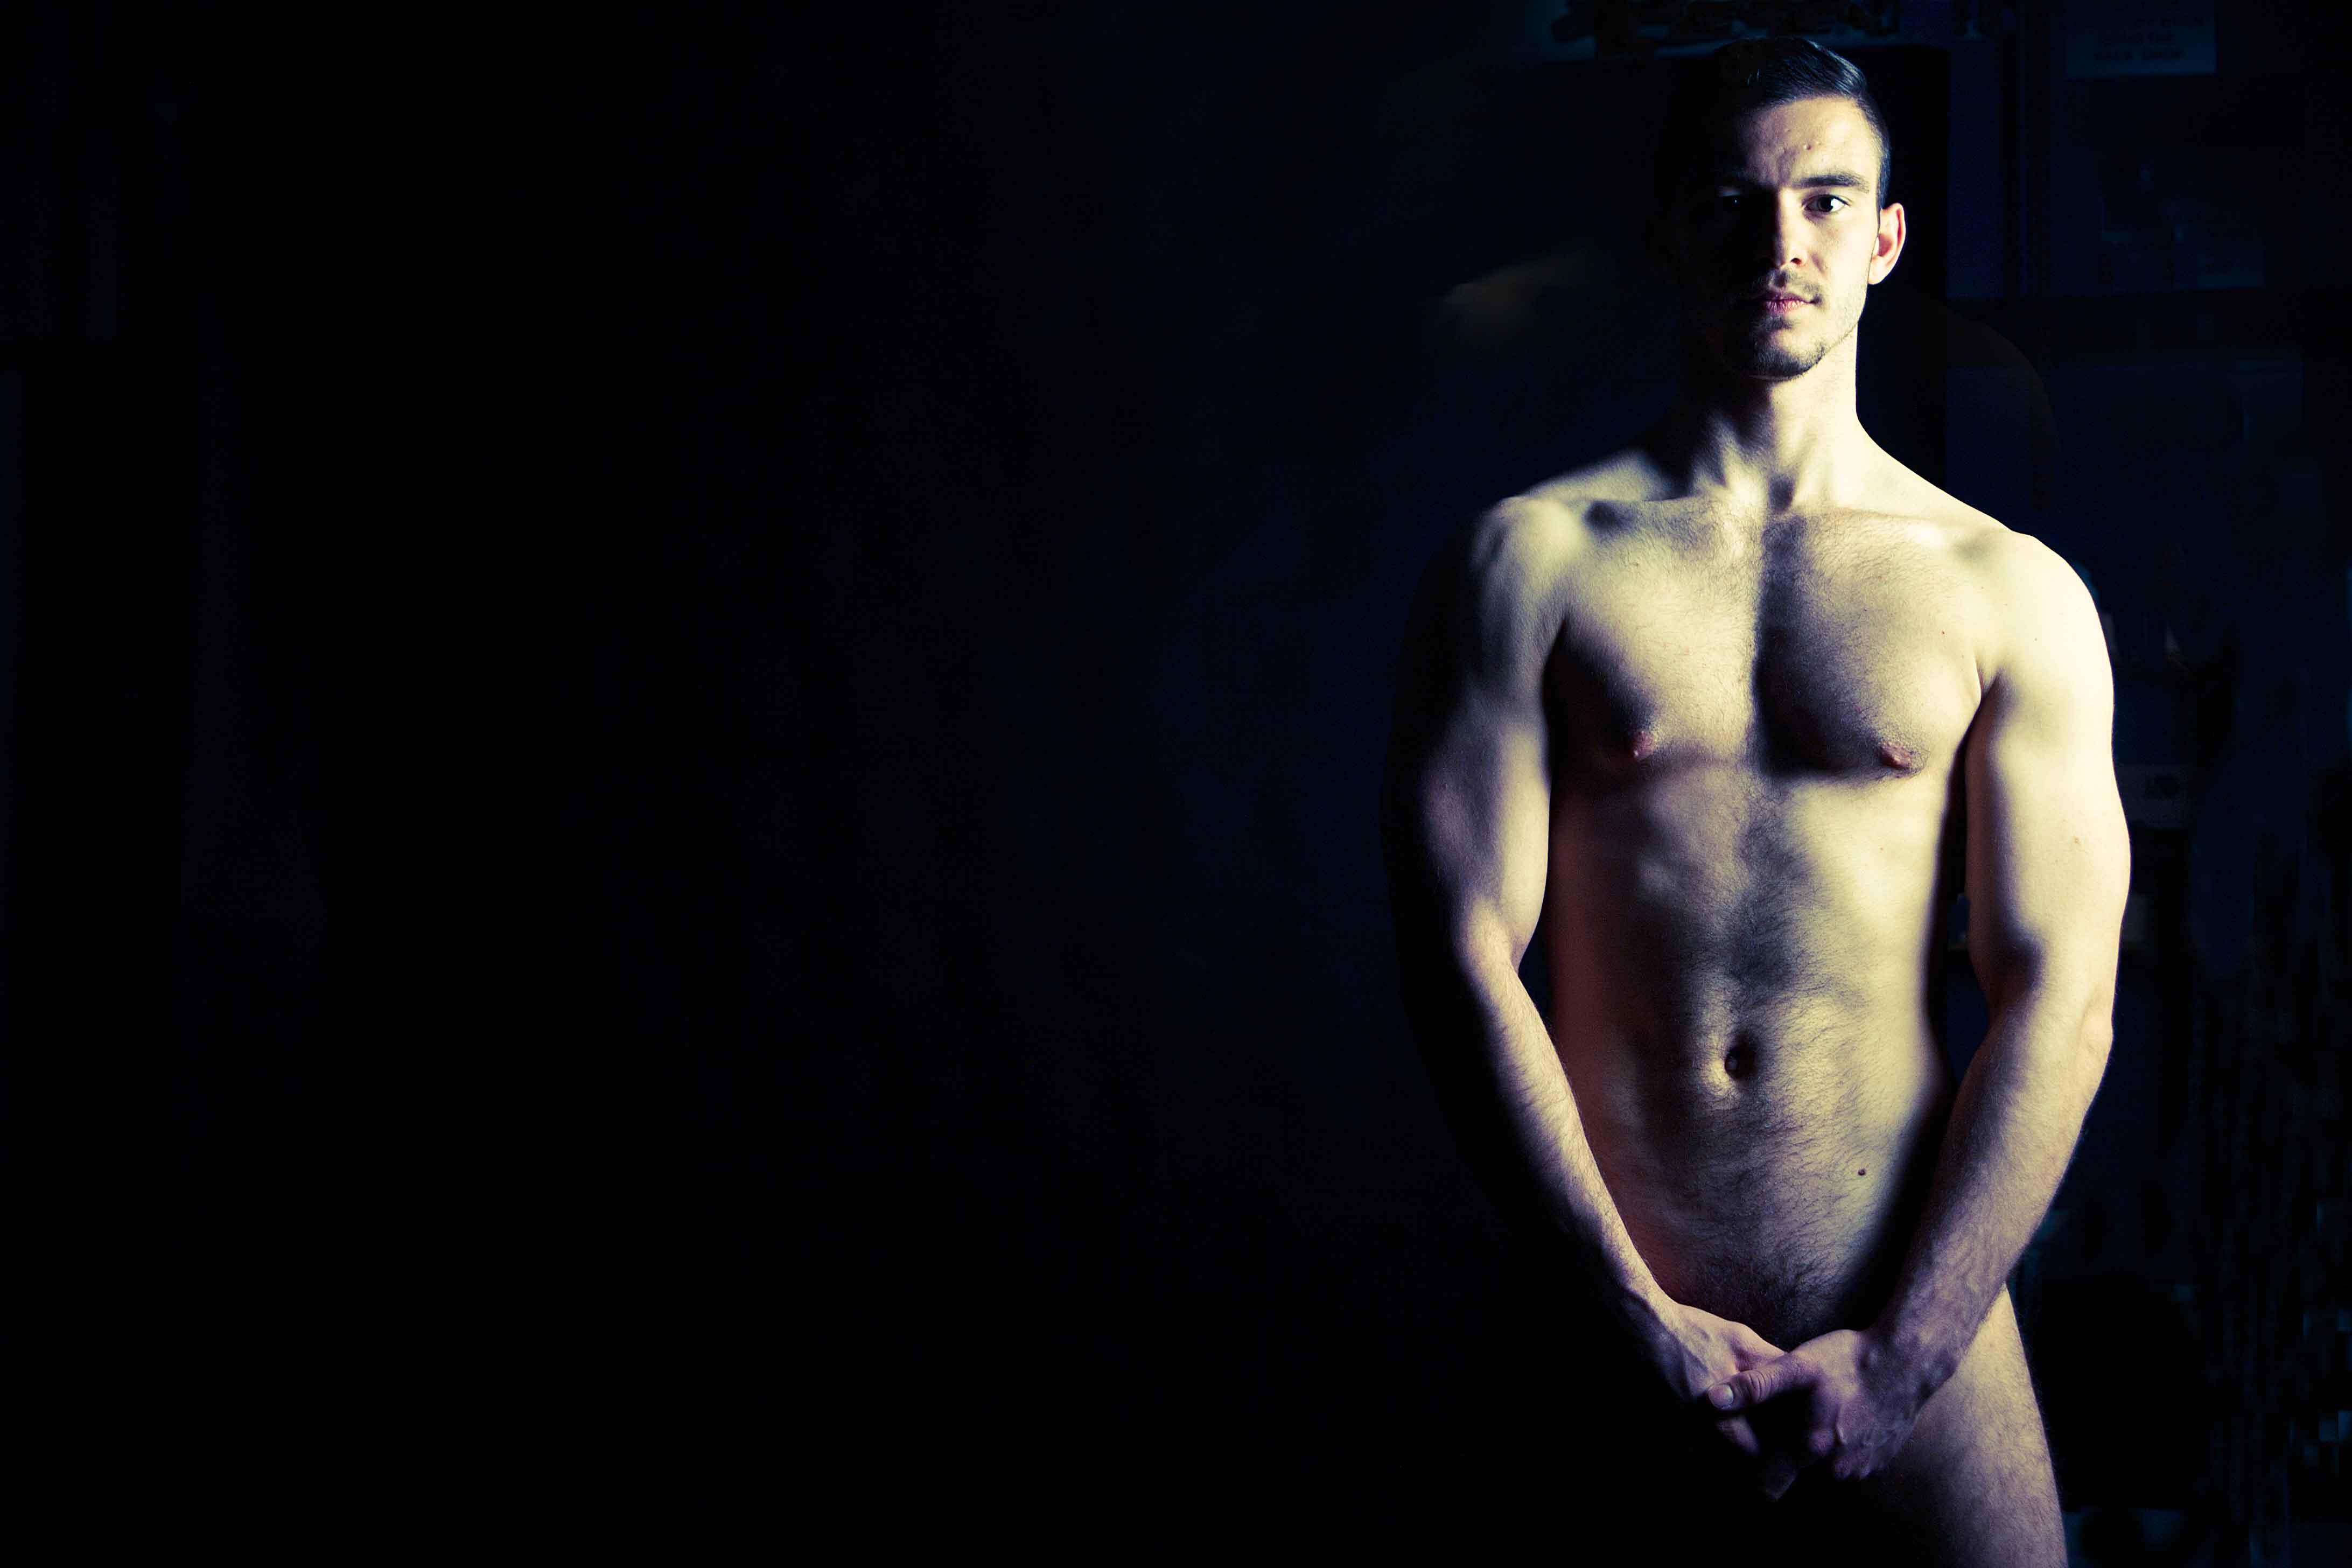 Wallpaper male nudes